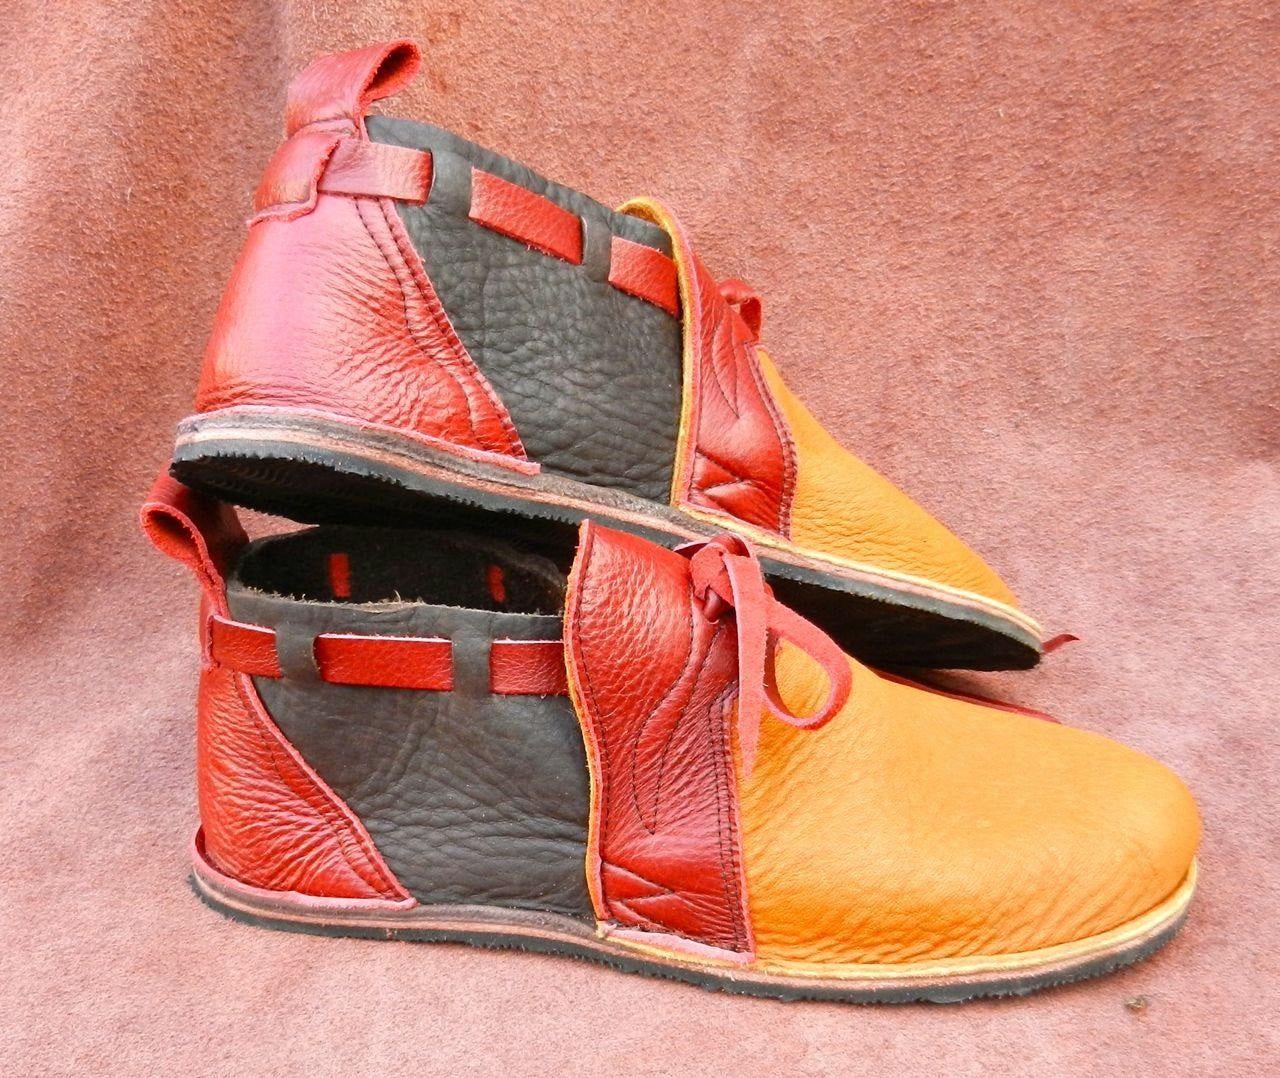 Custom Made or stock Size 5 Handmade Custom black Leather  Shoes-NO SHOES-Lightweight Vibram Sole Deer Skin Trim 9 8 6 10,11,12 7